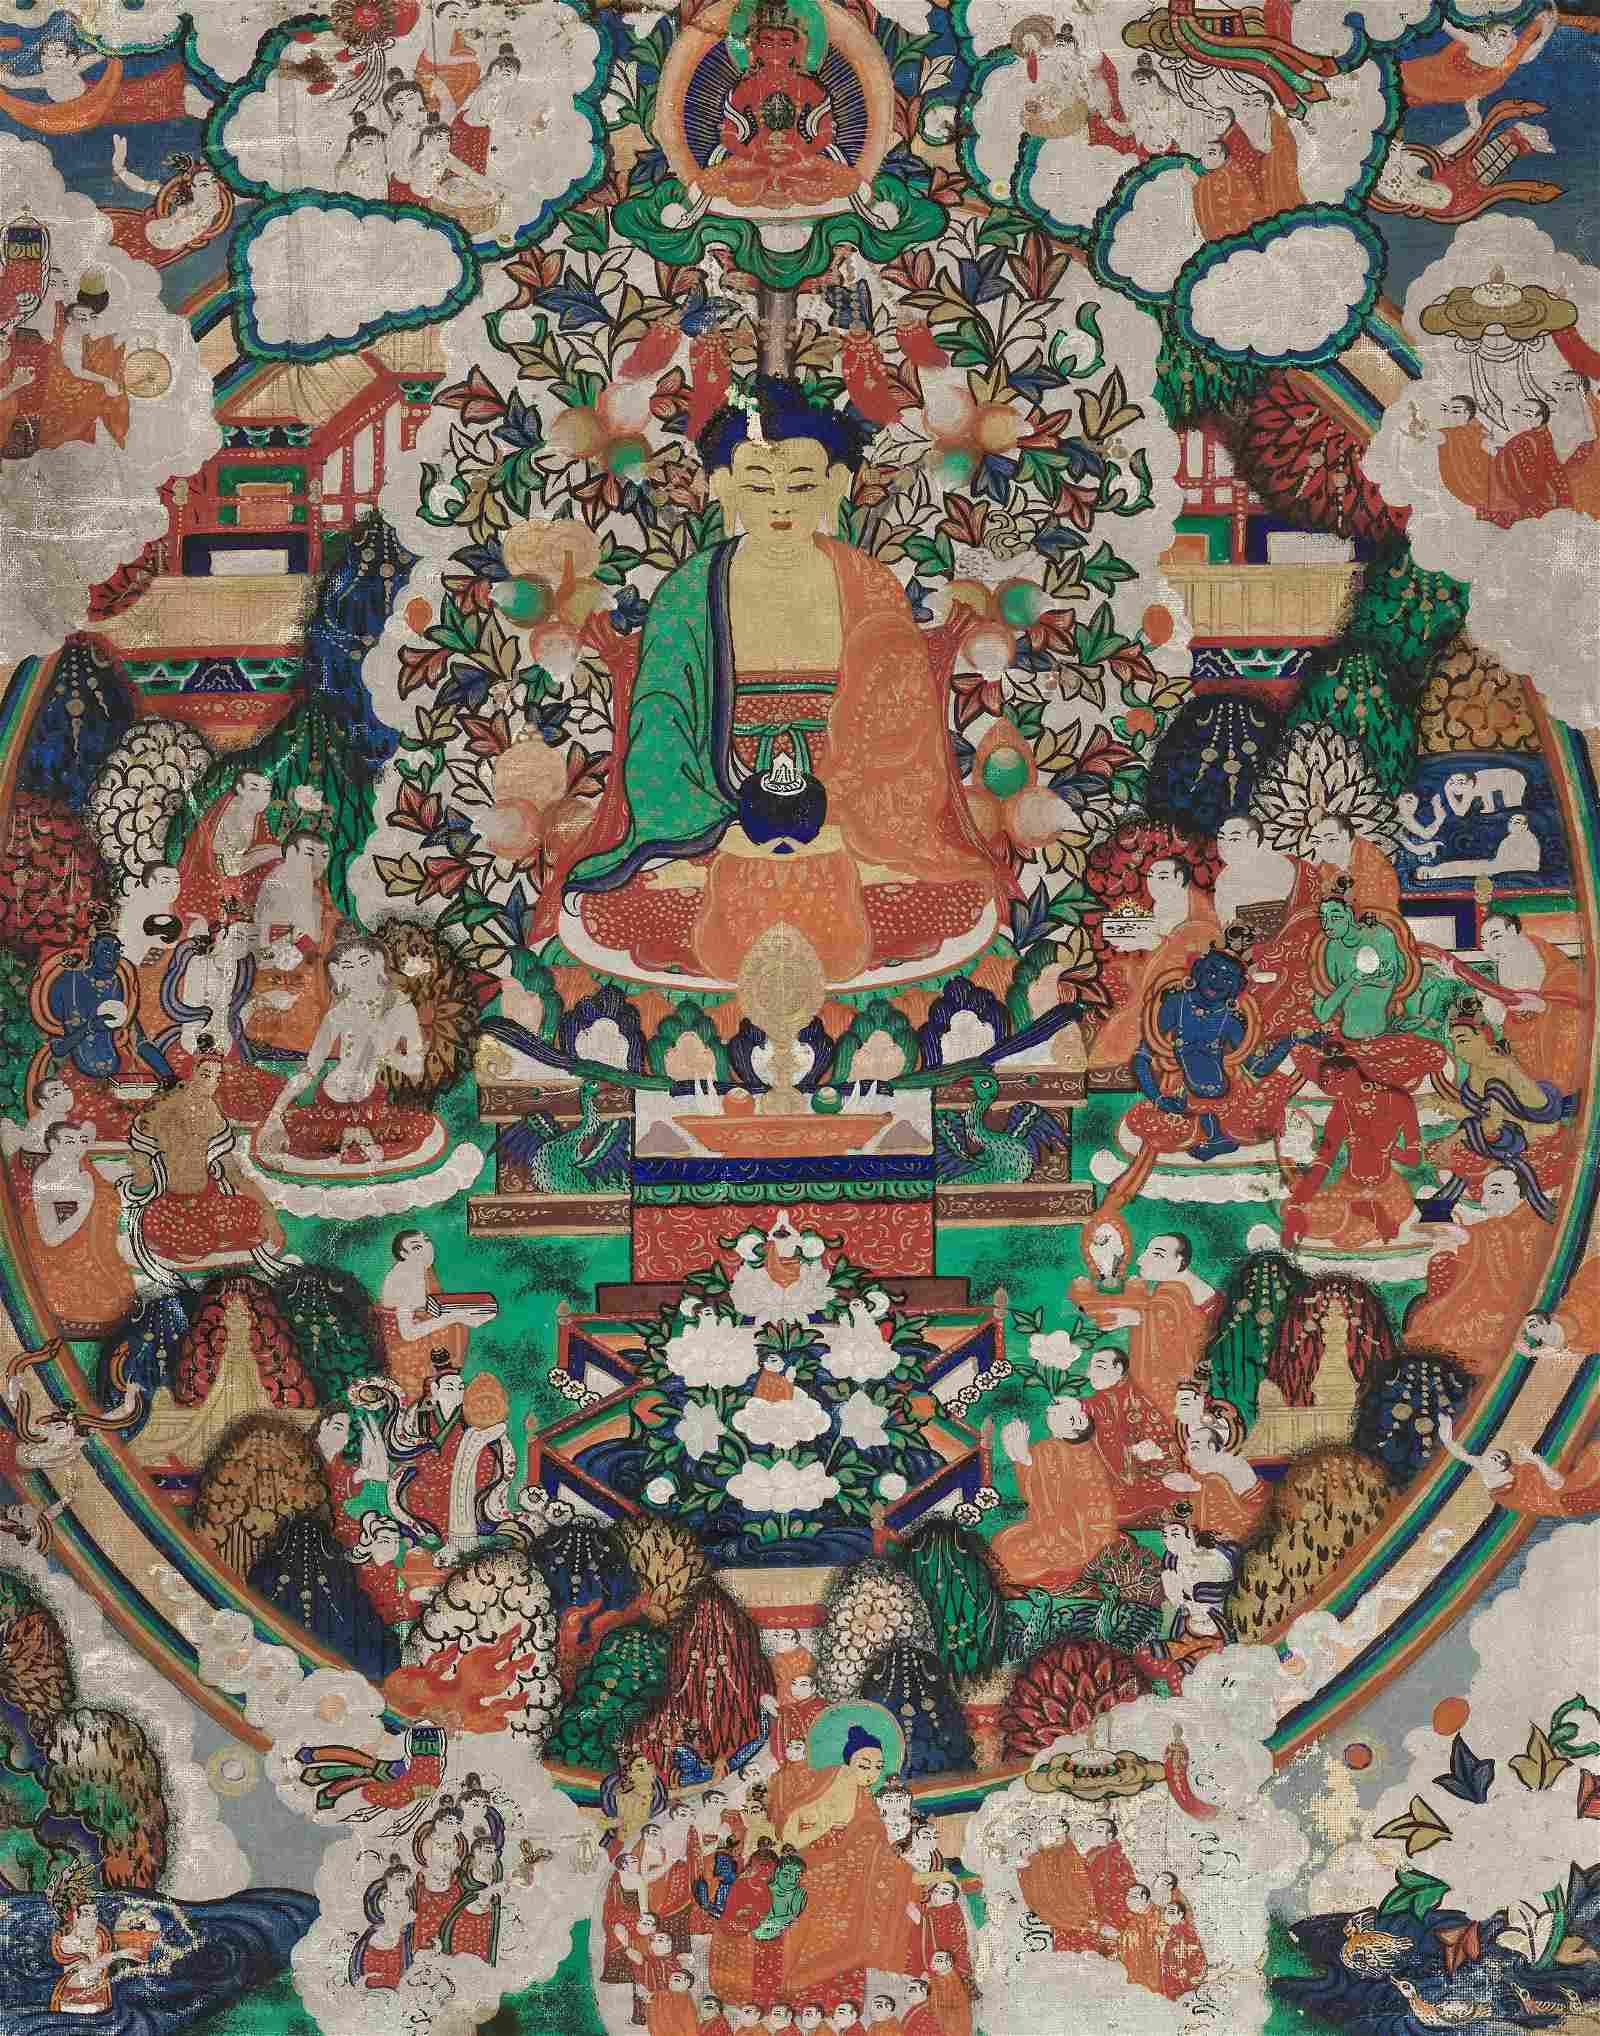 AN ICONIC THANGKA OF BUDDHA RESIDING IN SUKHAVATI